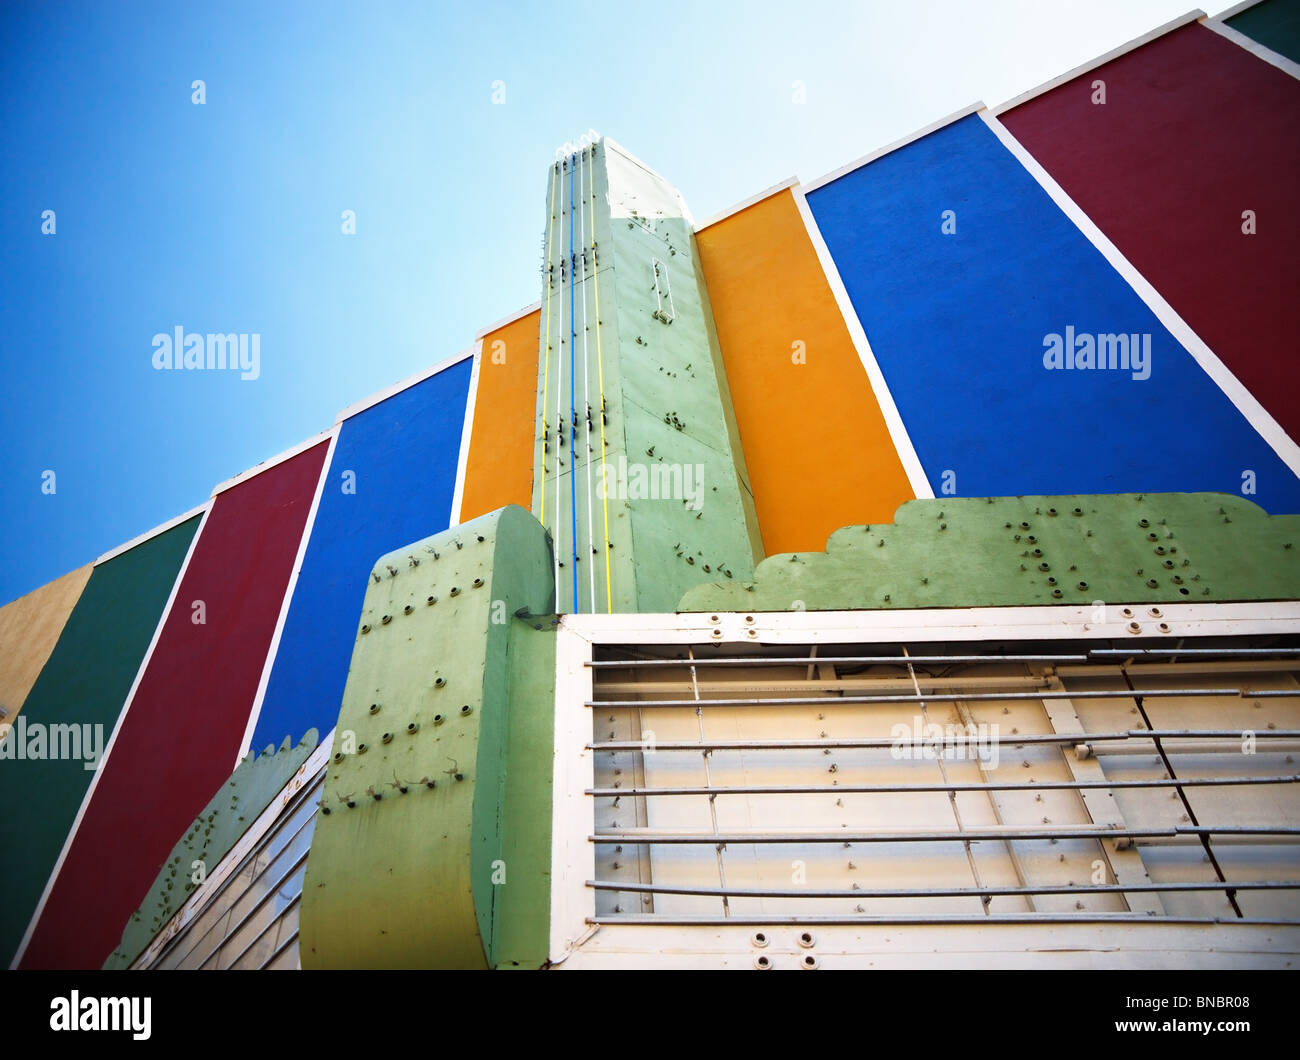 Art Deco Cinema in Natchez - Stock Image